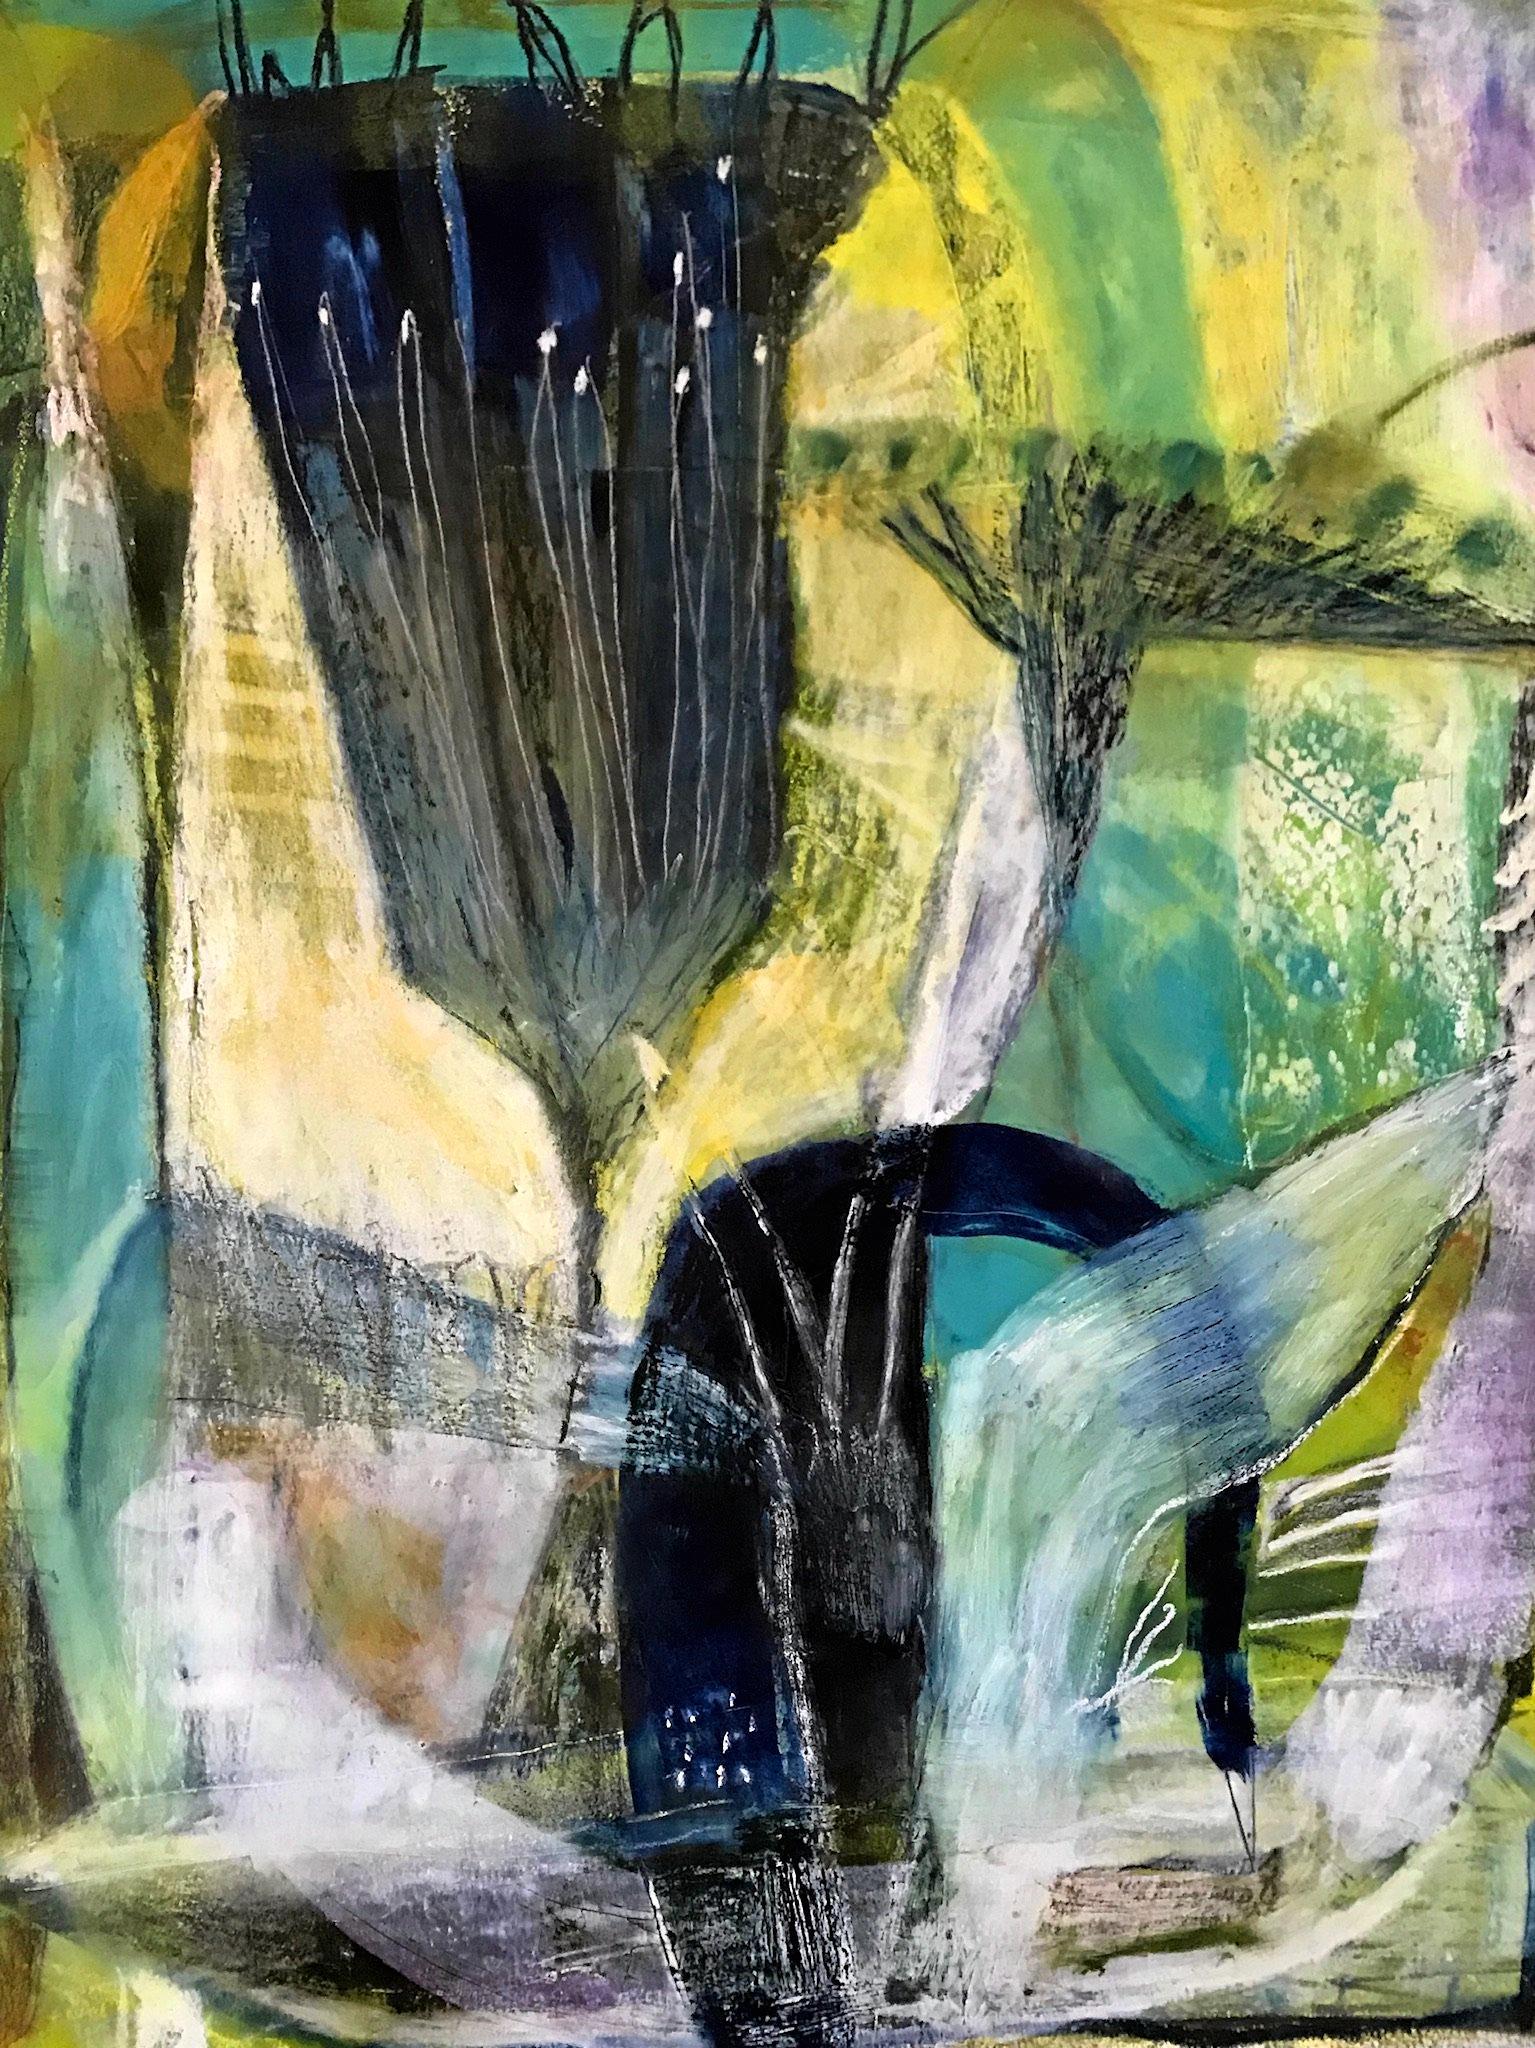 Blue Bird Bending by Bundaberg artist Liz Lennox.